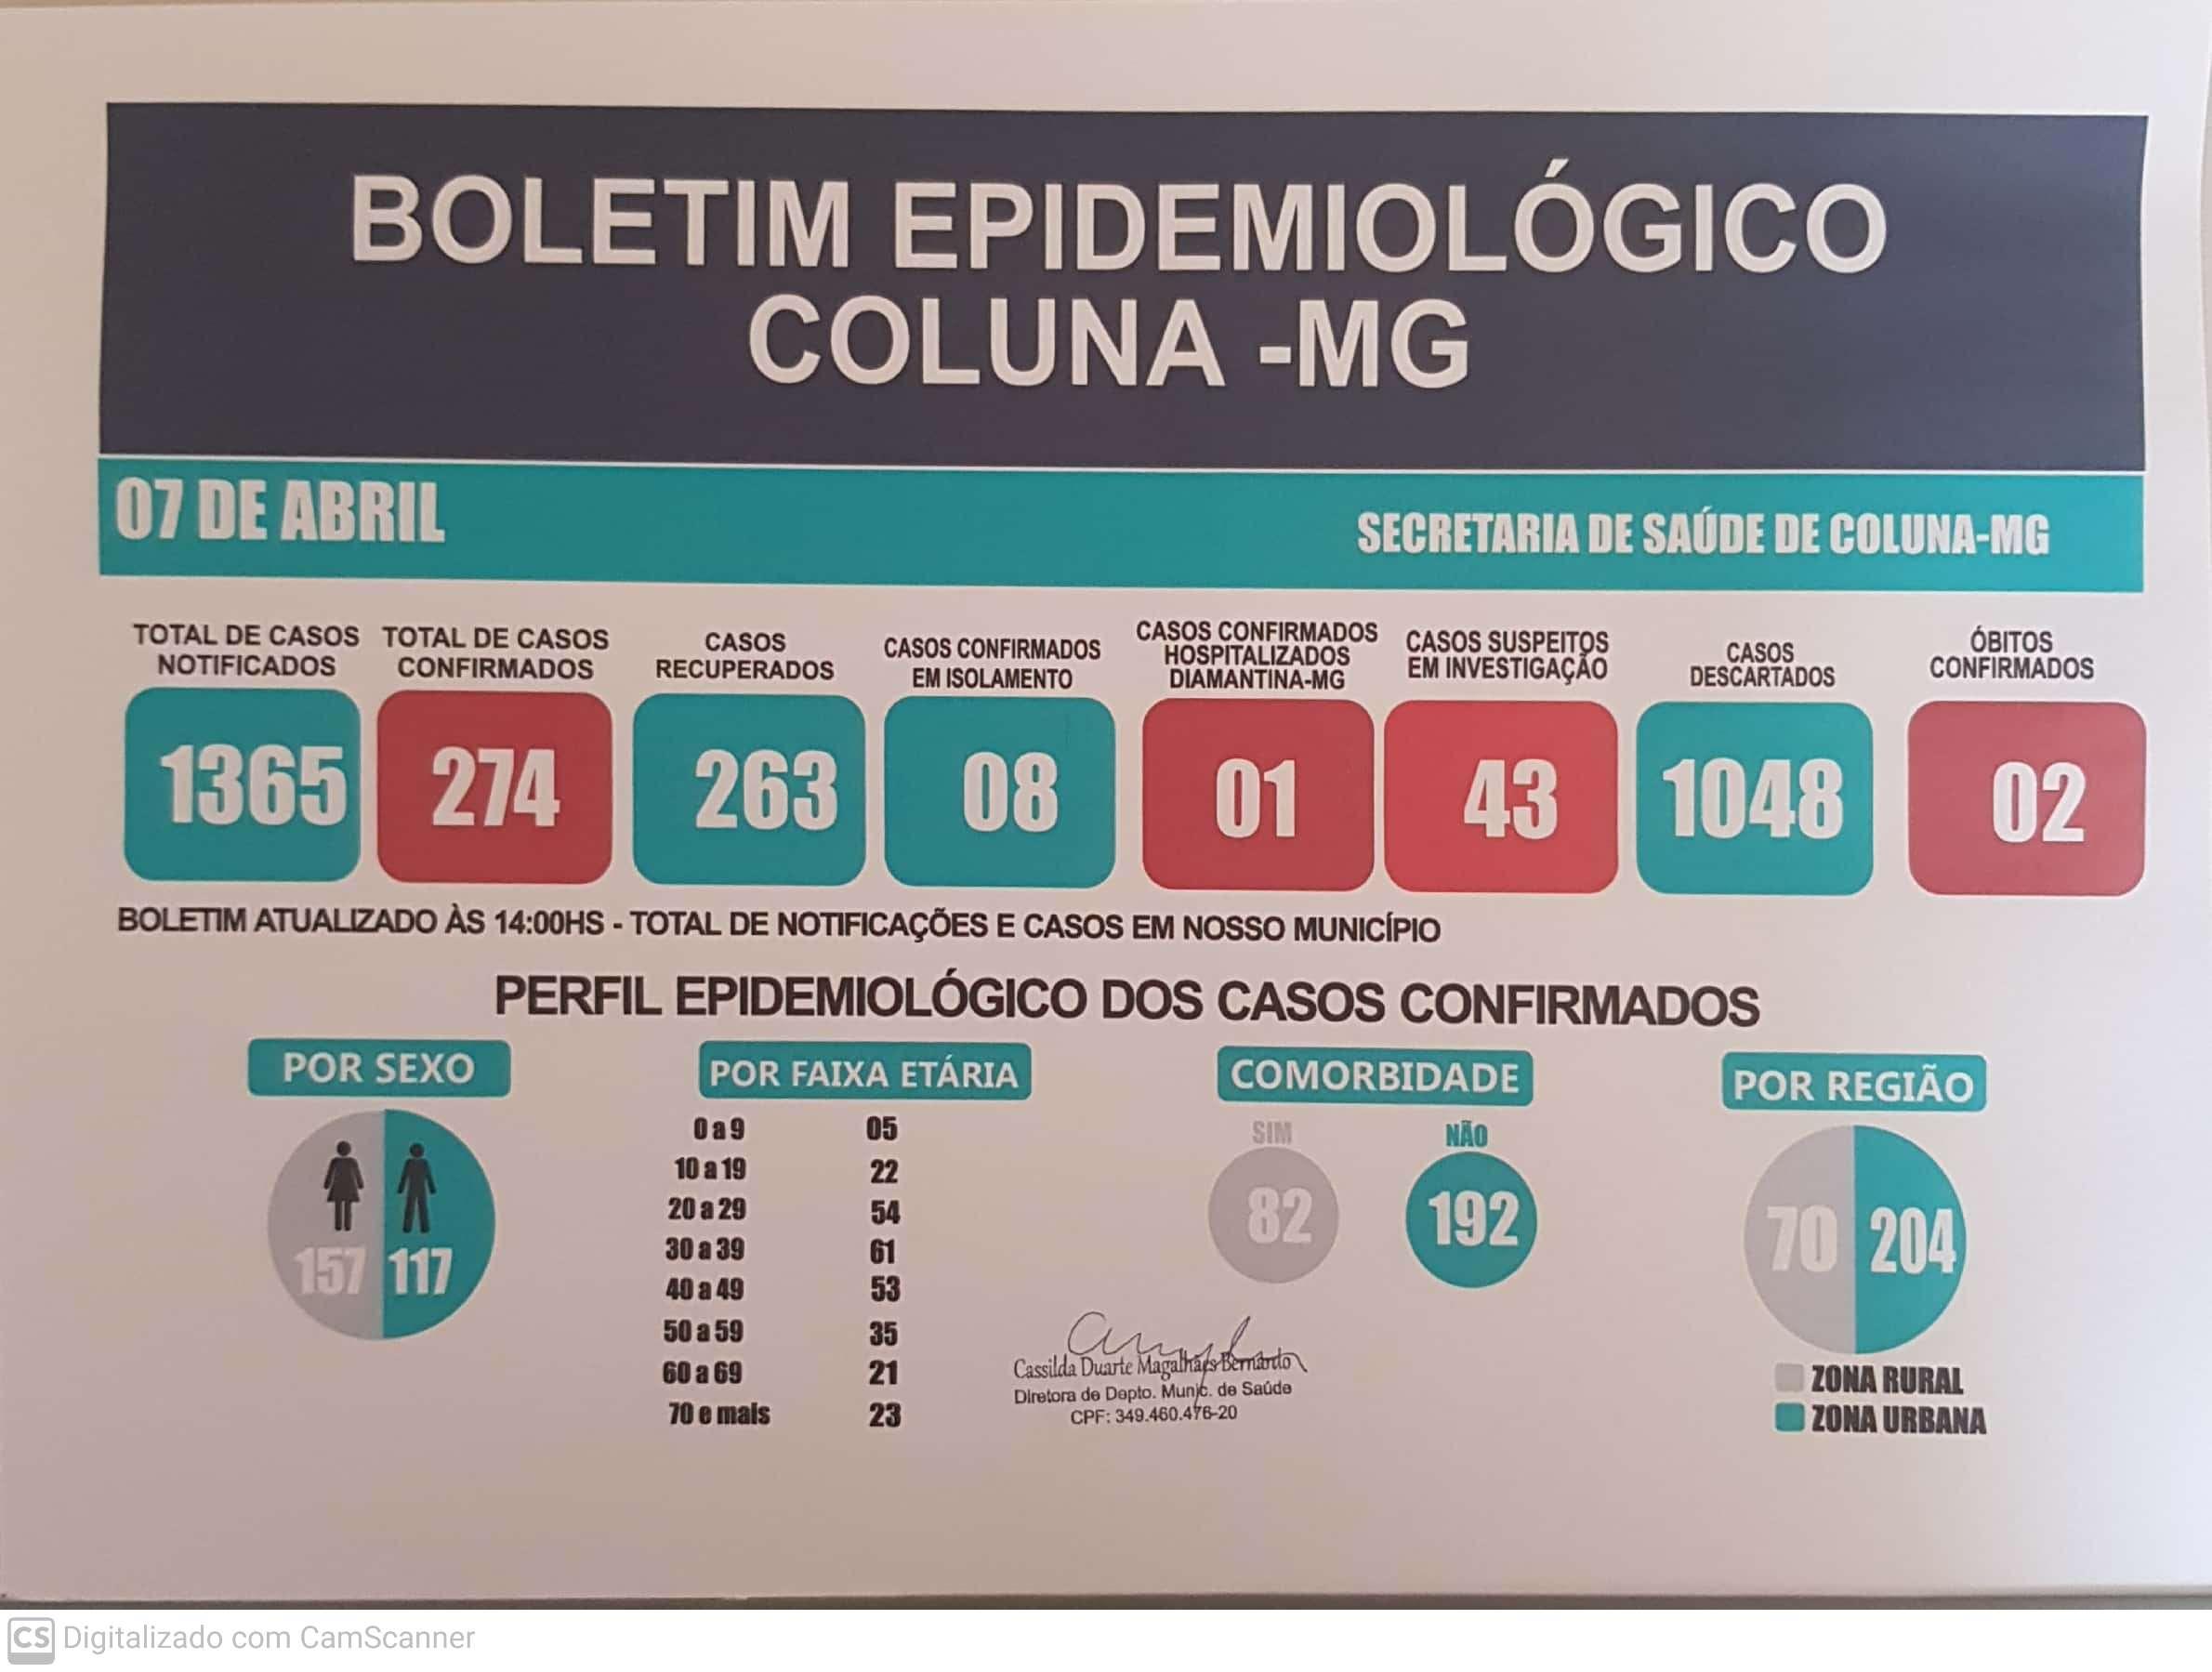 BOLETIM EPIDEMIOLÓGICO COLUNA - MG 07/04/2021